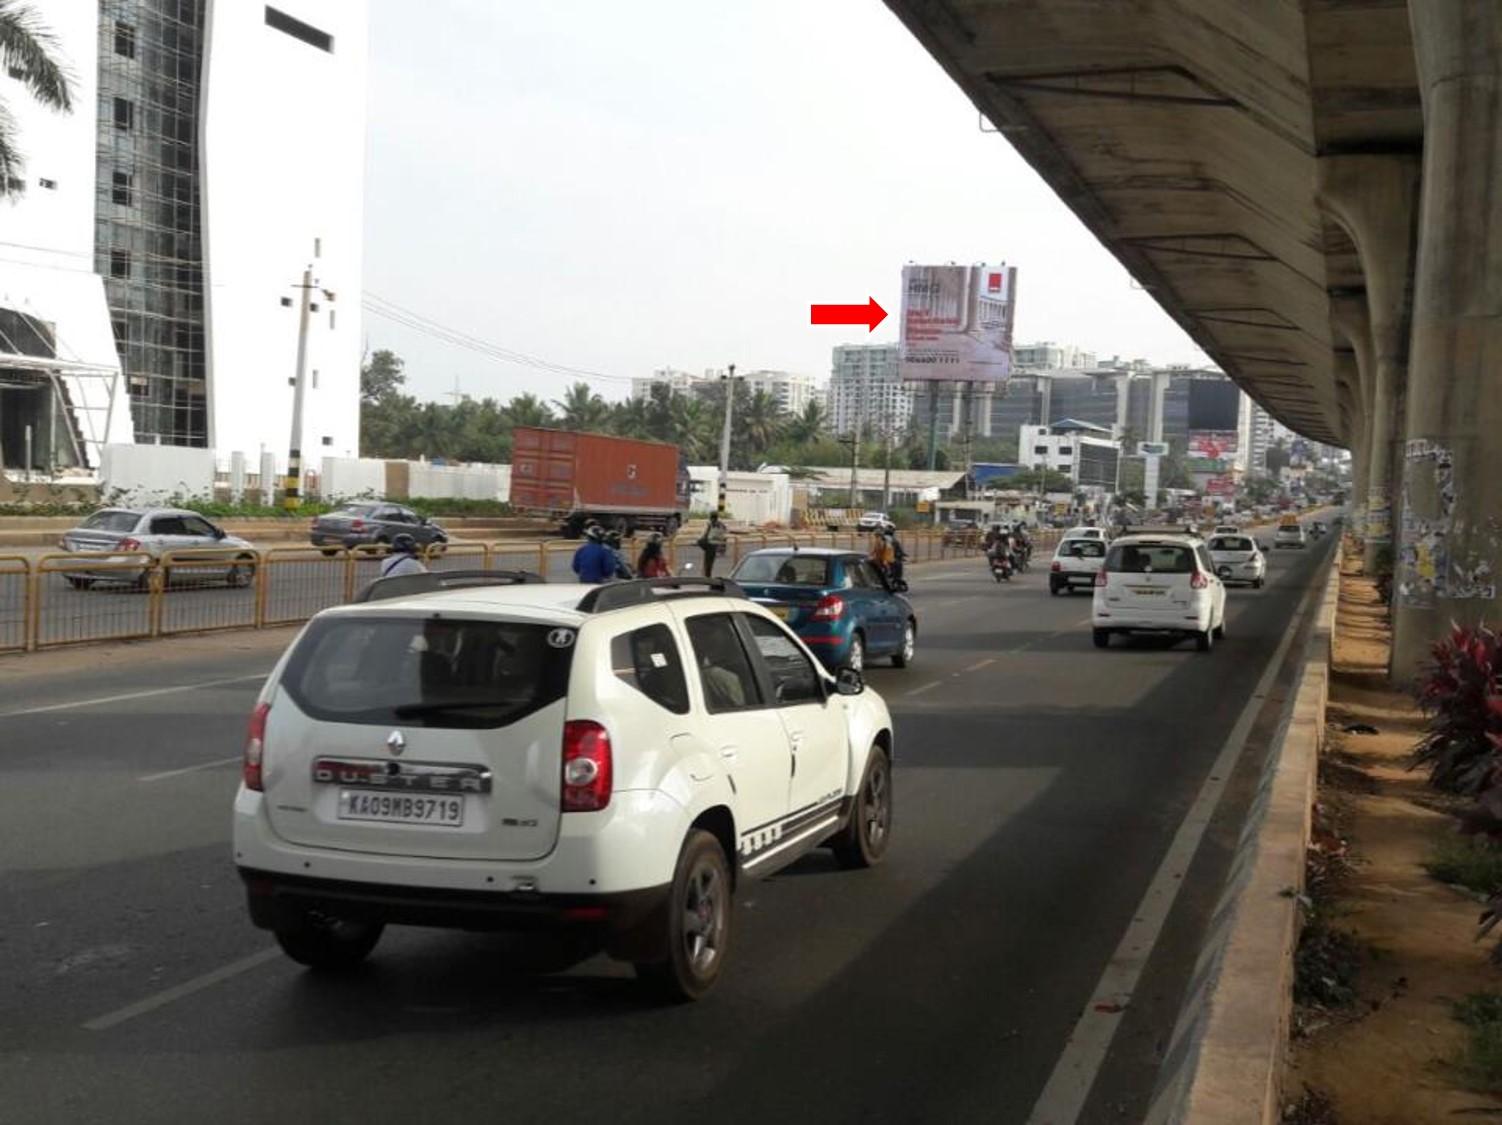 From Airport, Nr Sahakar Nagara FTT Hebbal Fly Over, Bangalore